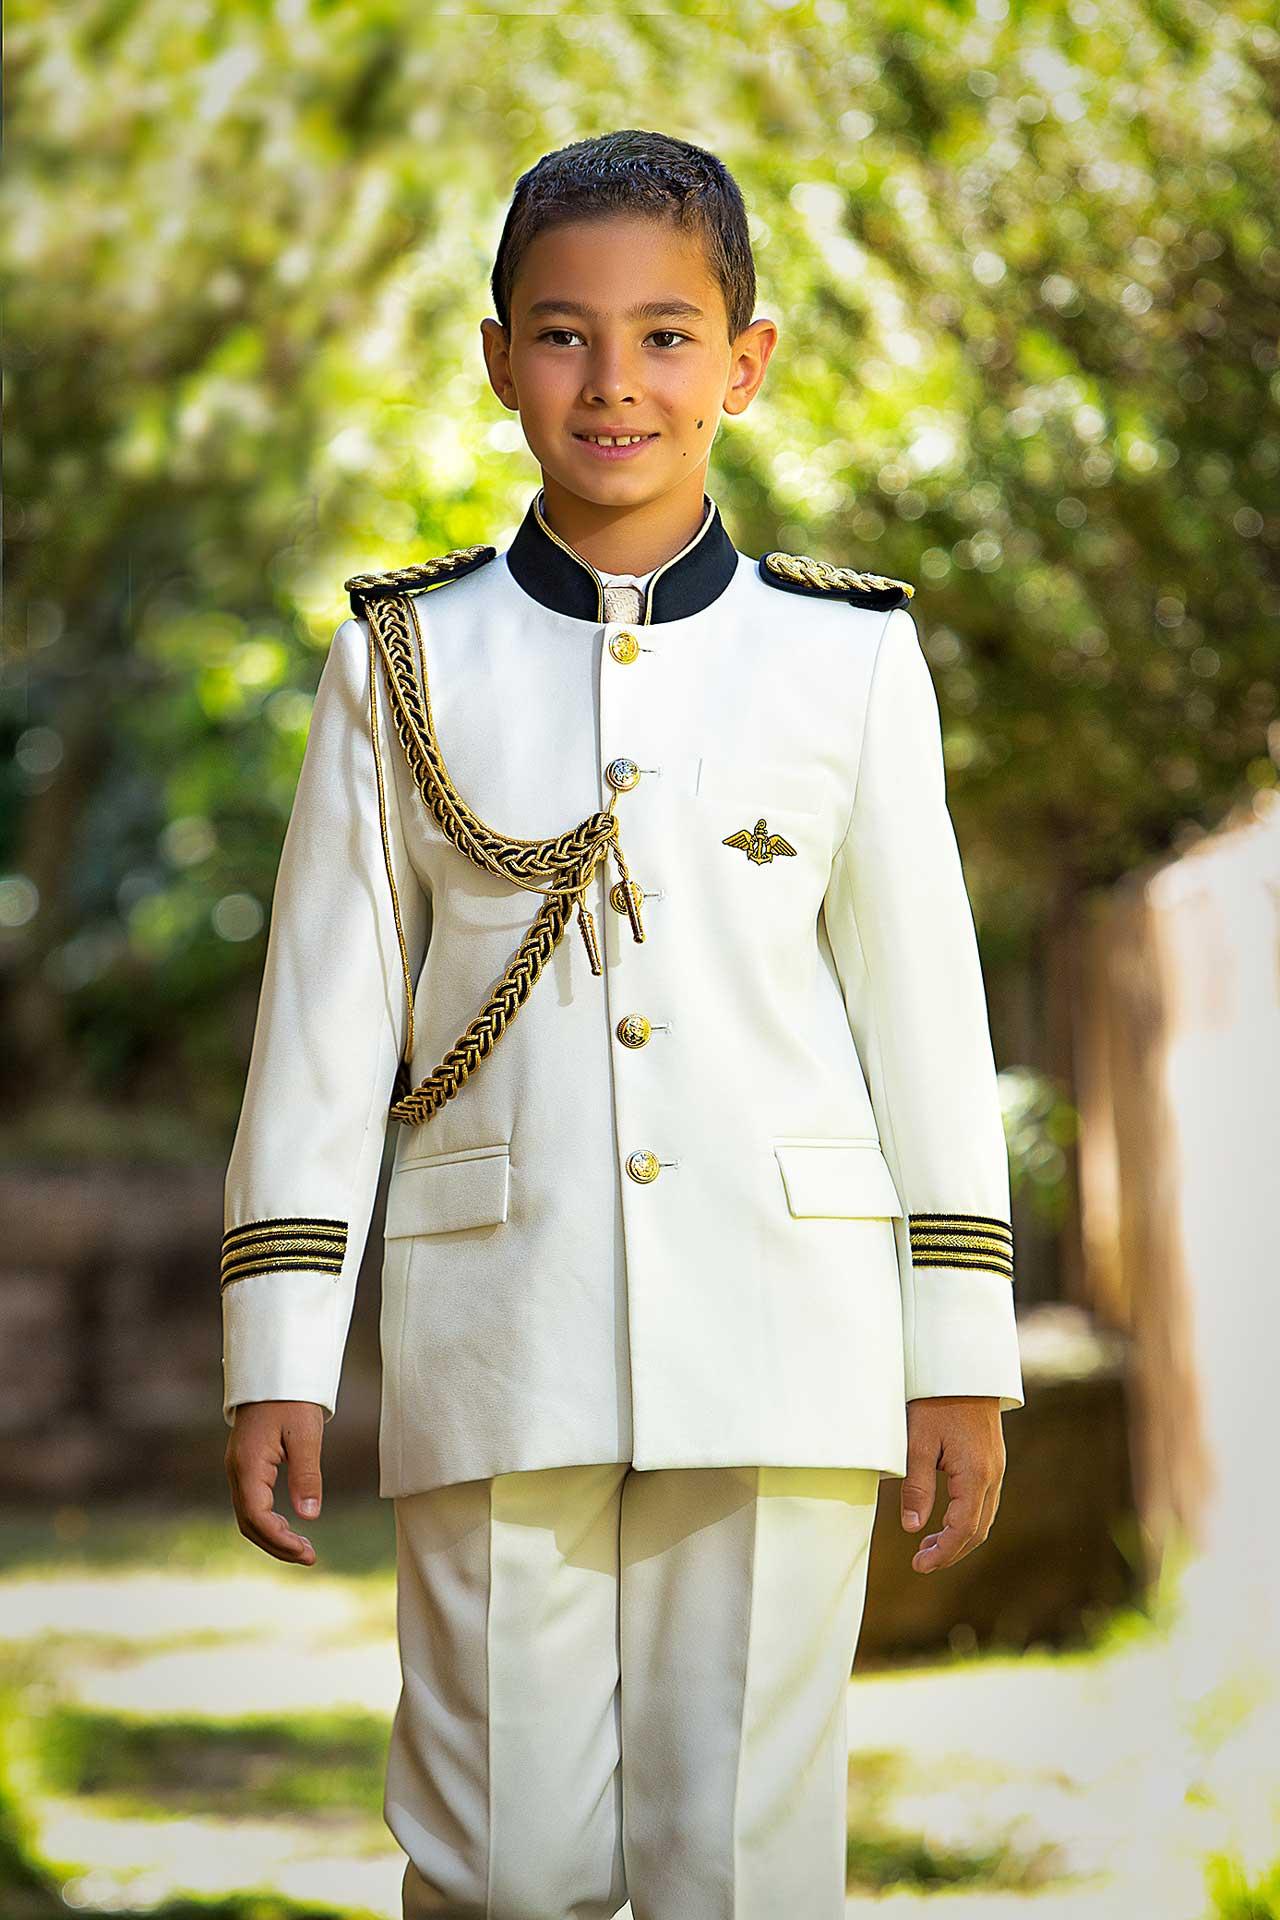 https://www.kidsphotography.es/wp-content/uploads/2021/05/Reportaje-de-Comunion-Adrian-0243-©-Kids-Photography.jpg